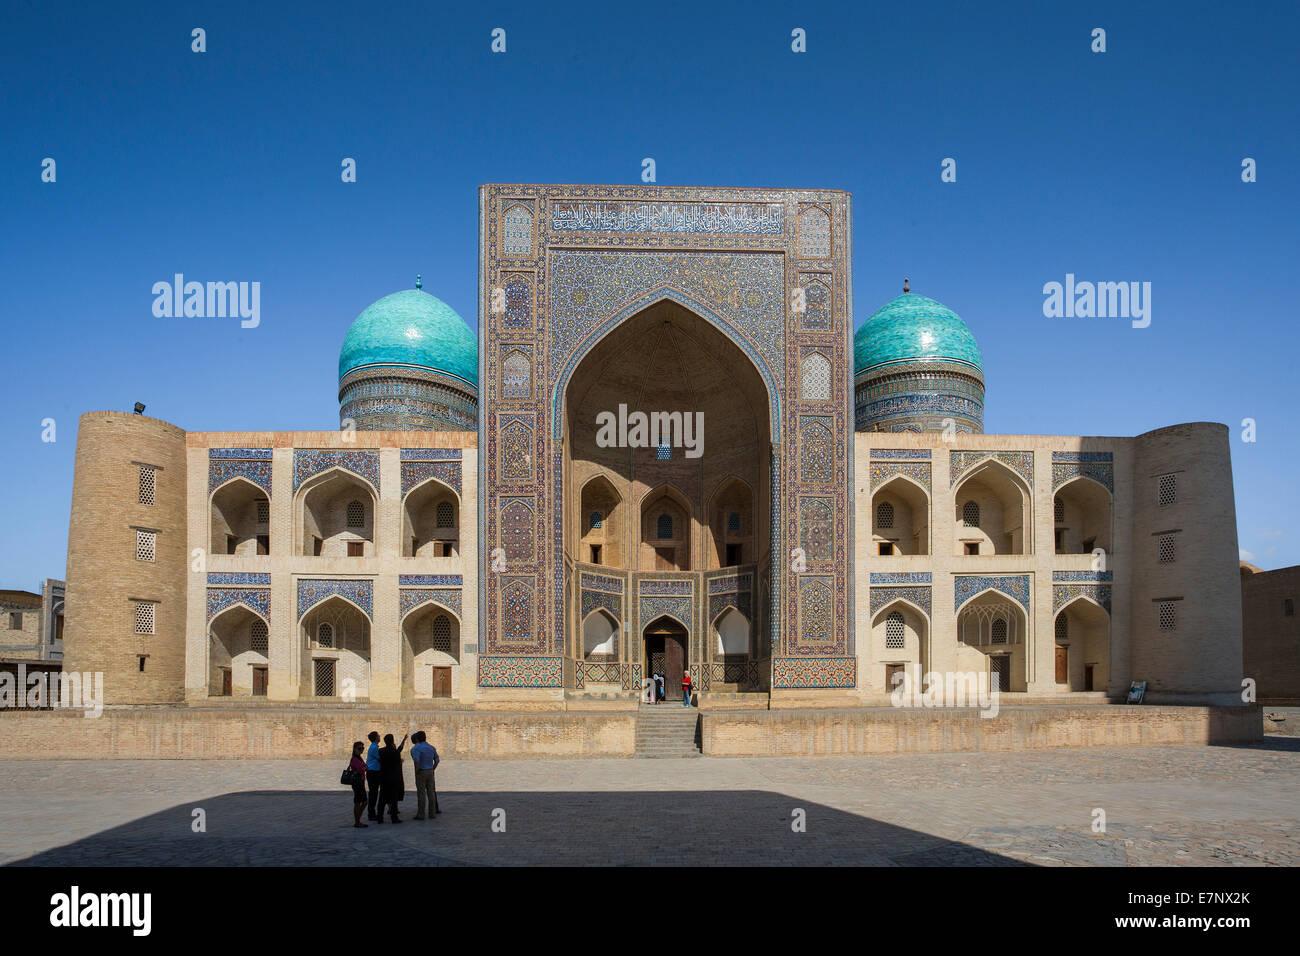 Bukhara, Medressah, Miri Arab, Uzbekistan, Central Asia, Asia, architecture, city, colourful, history, silk road, - Stock Image